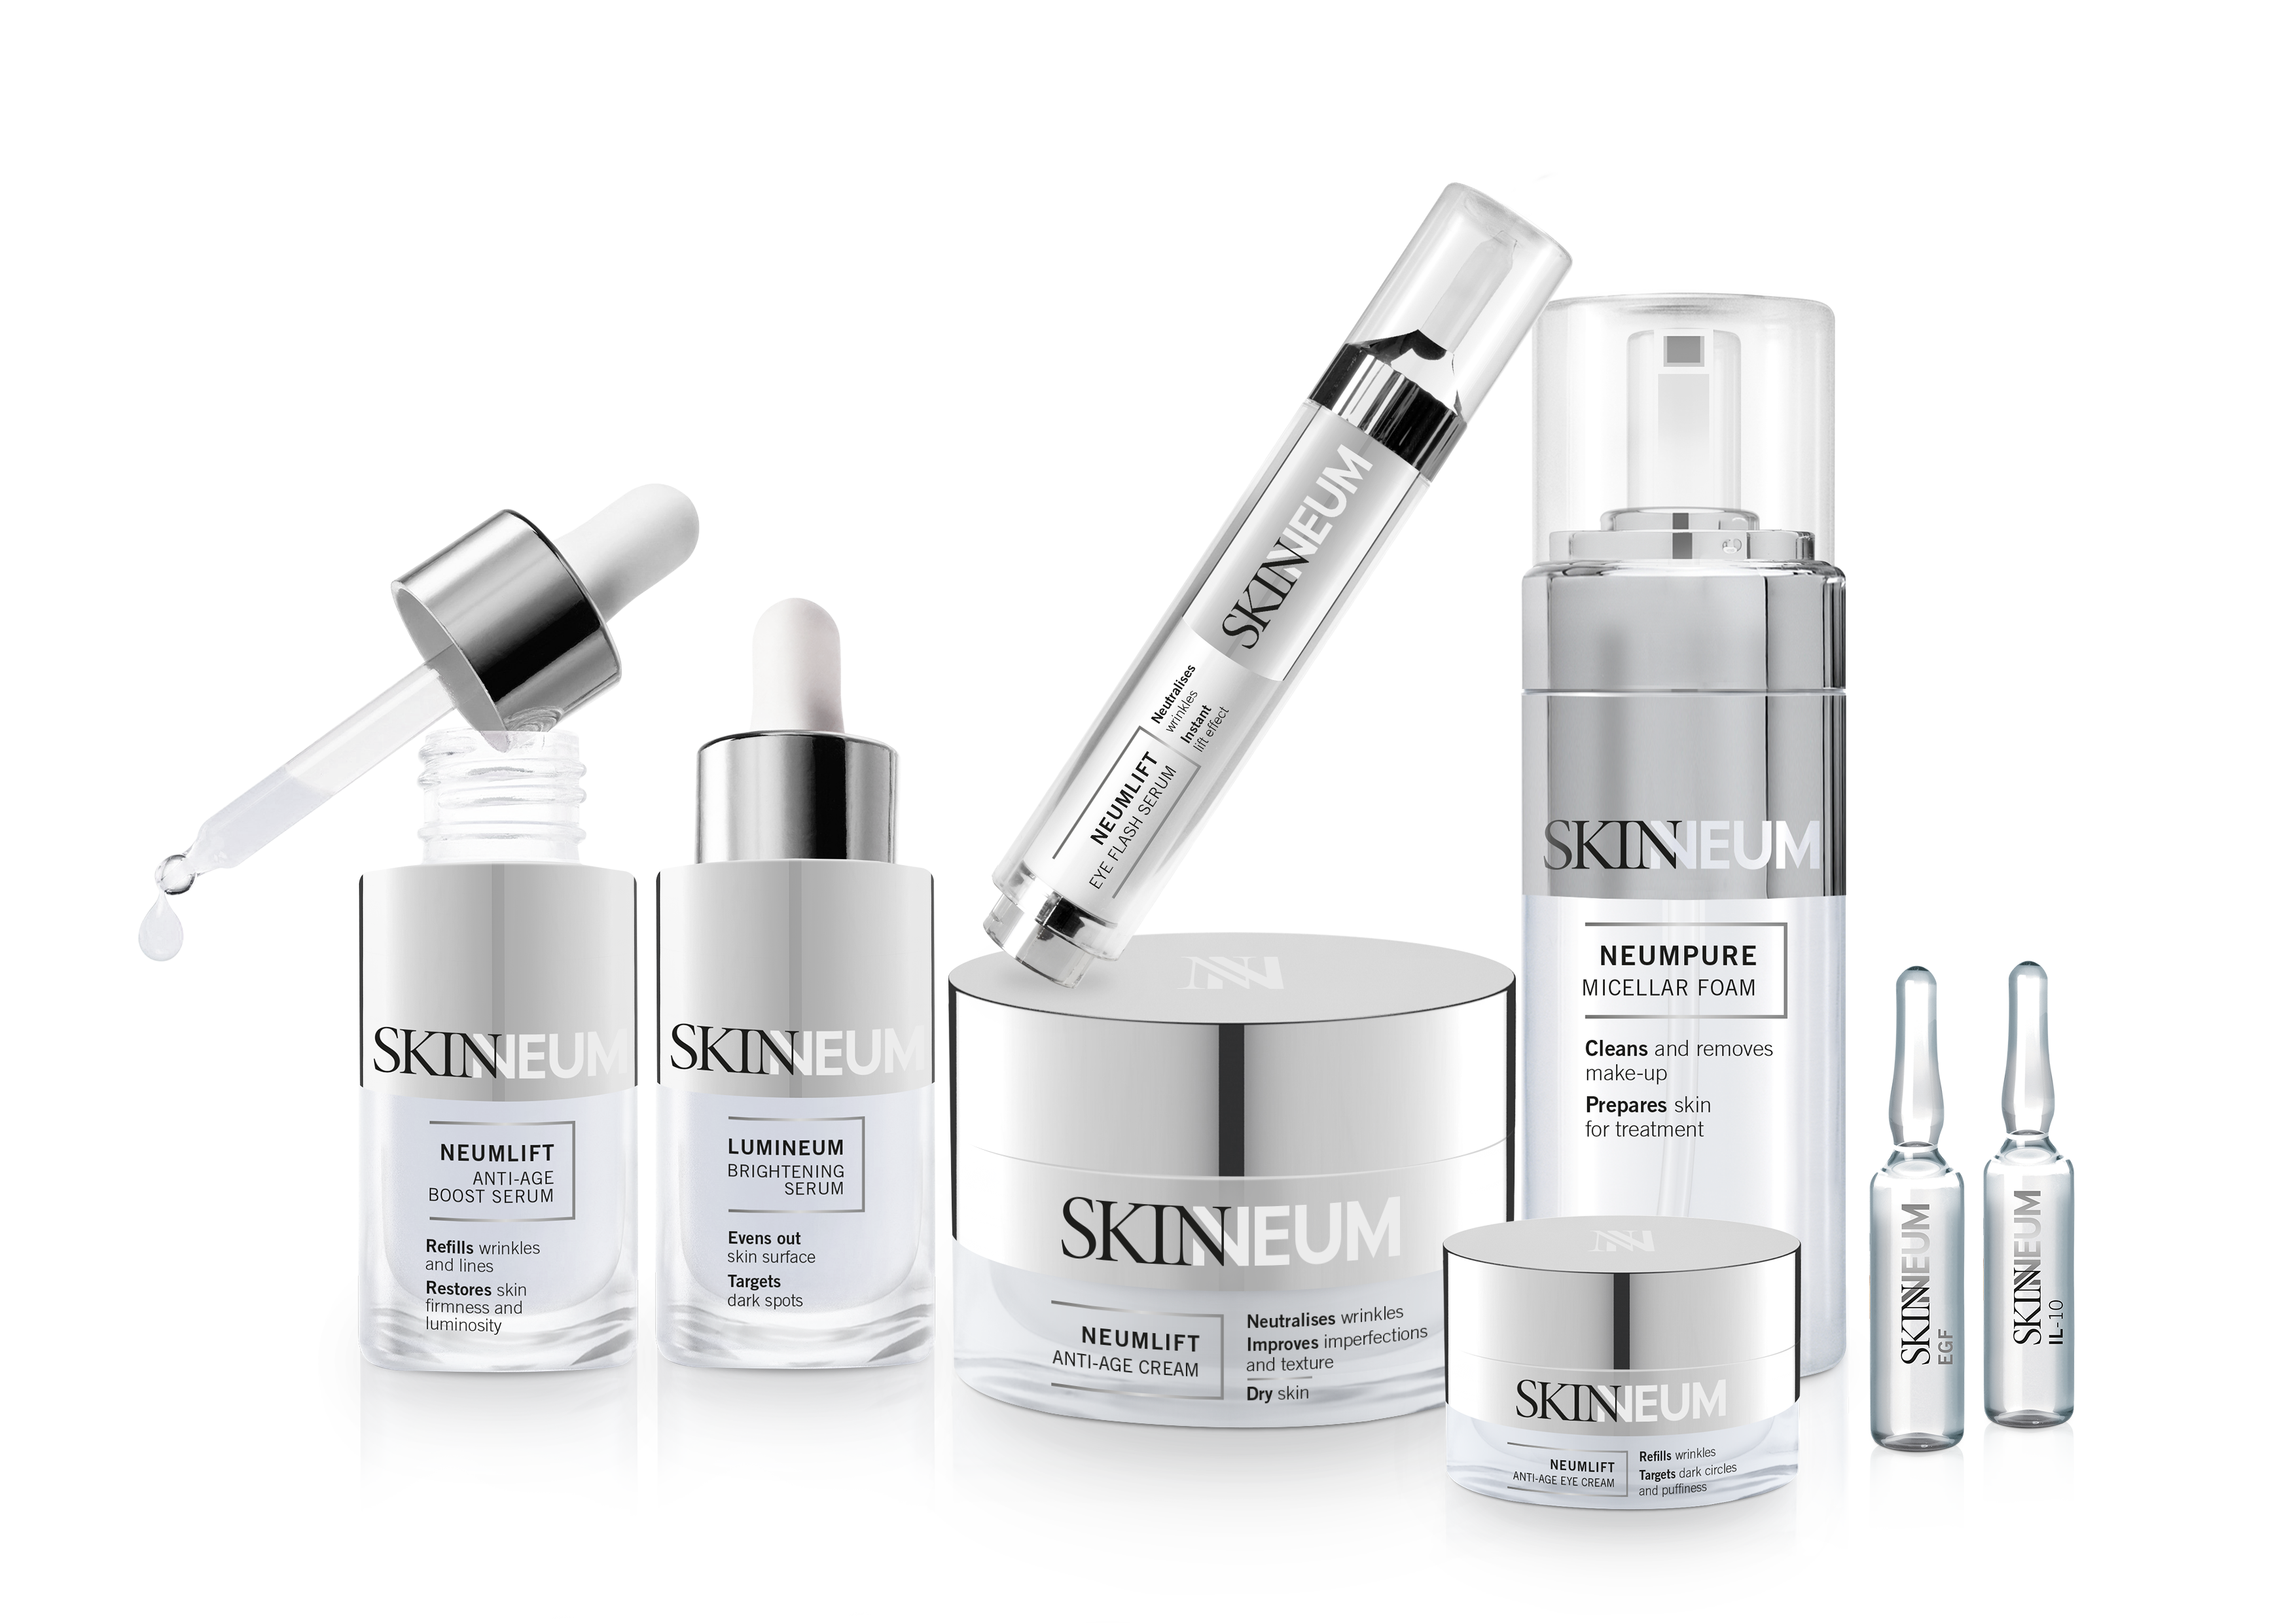 skinneum_bodegon_productos